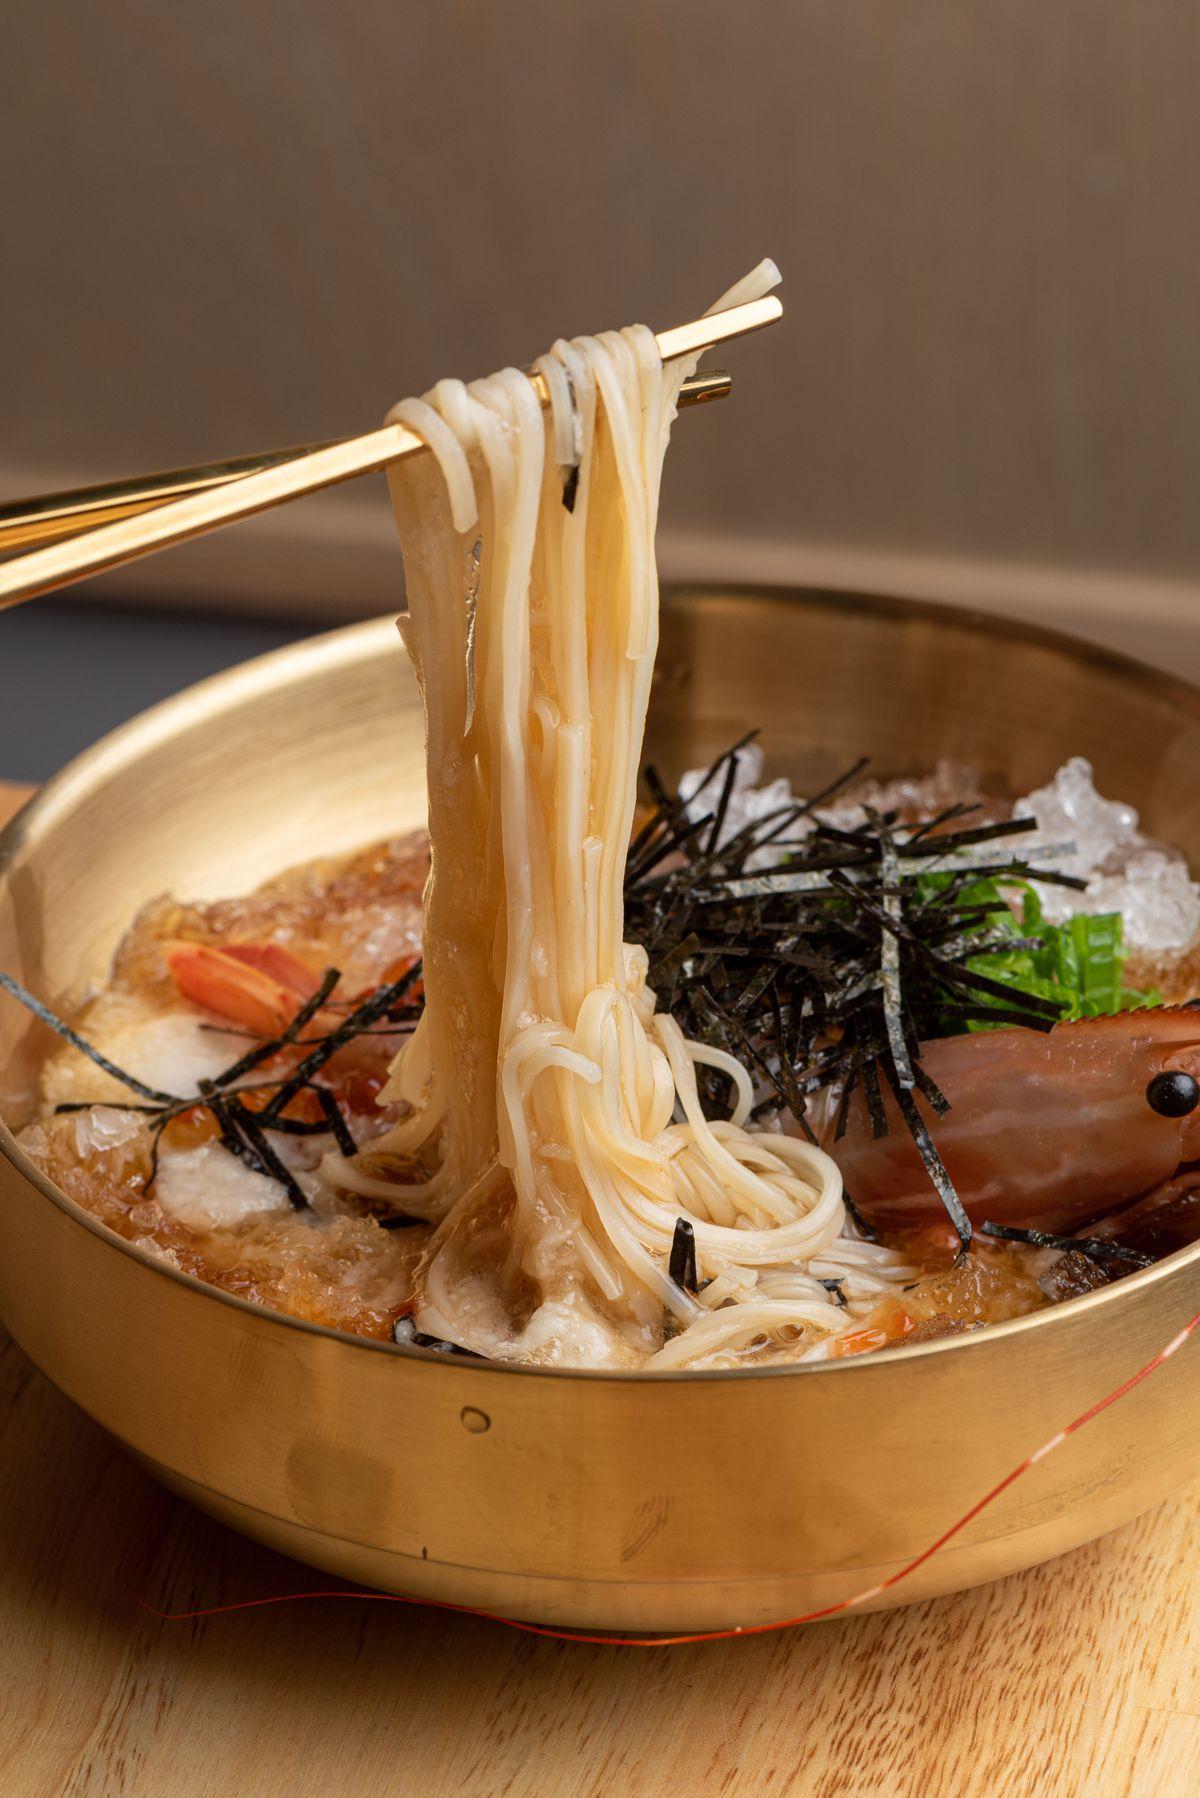 Cold udon noodles at Yakiniku Osen.